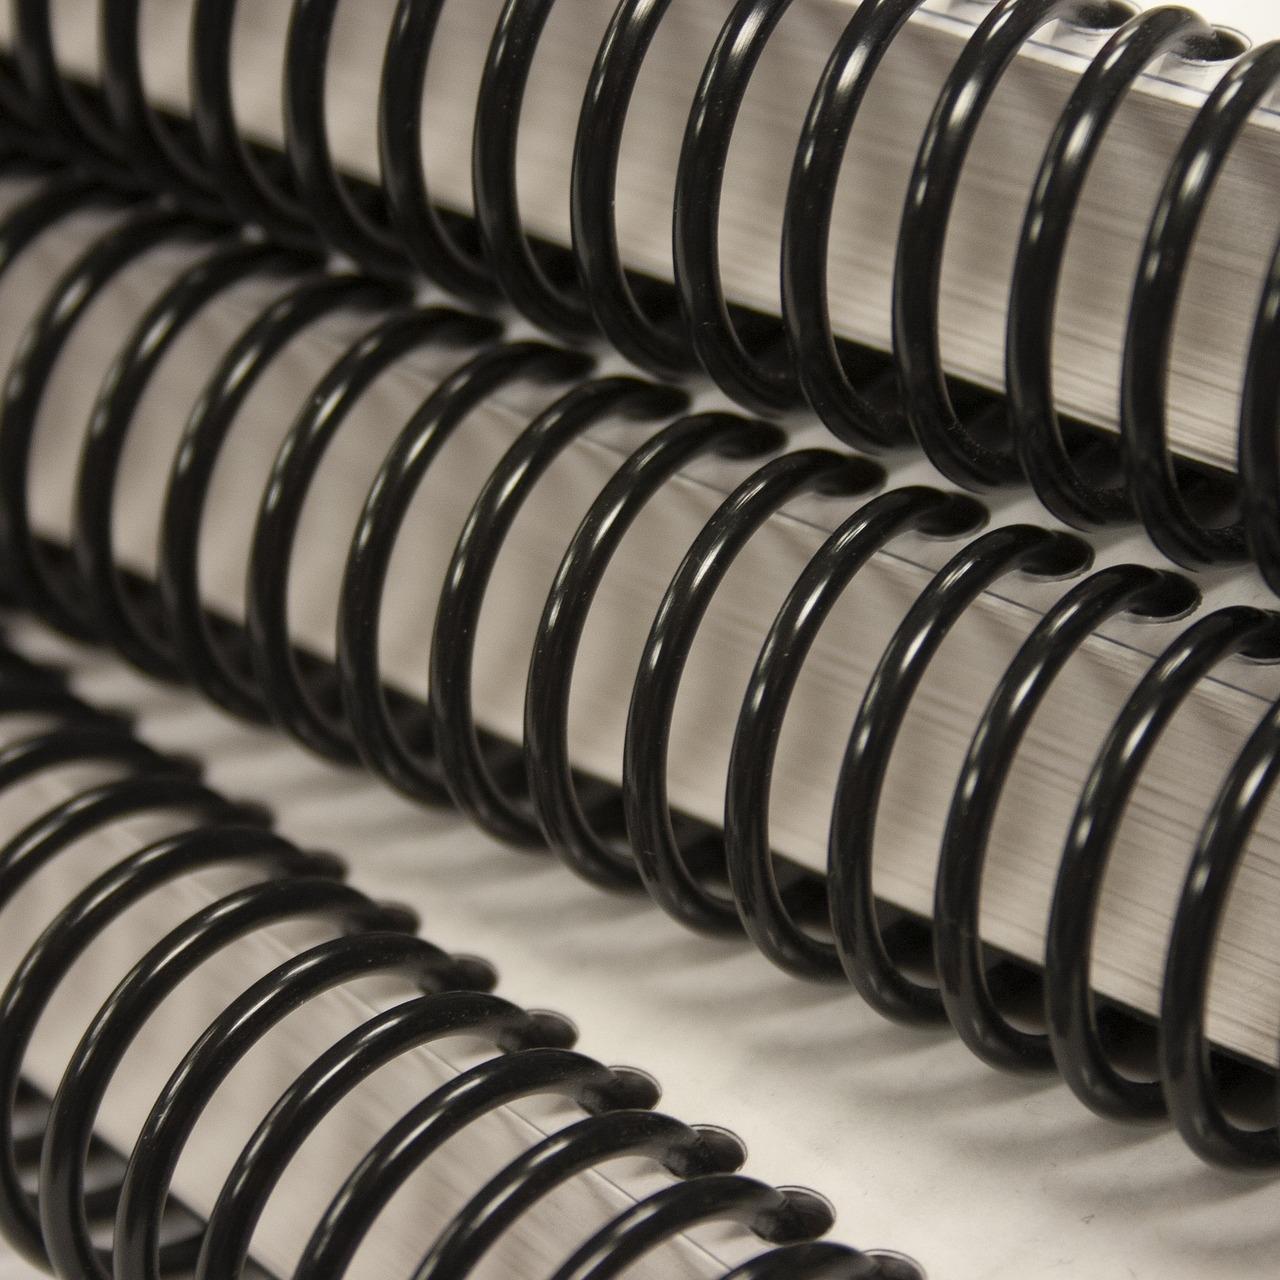 coils-3398356_1920.jpg